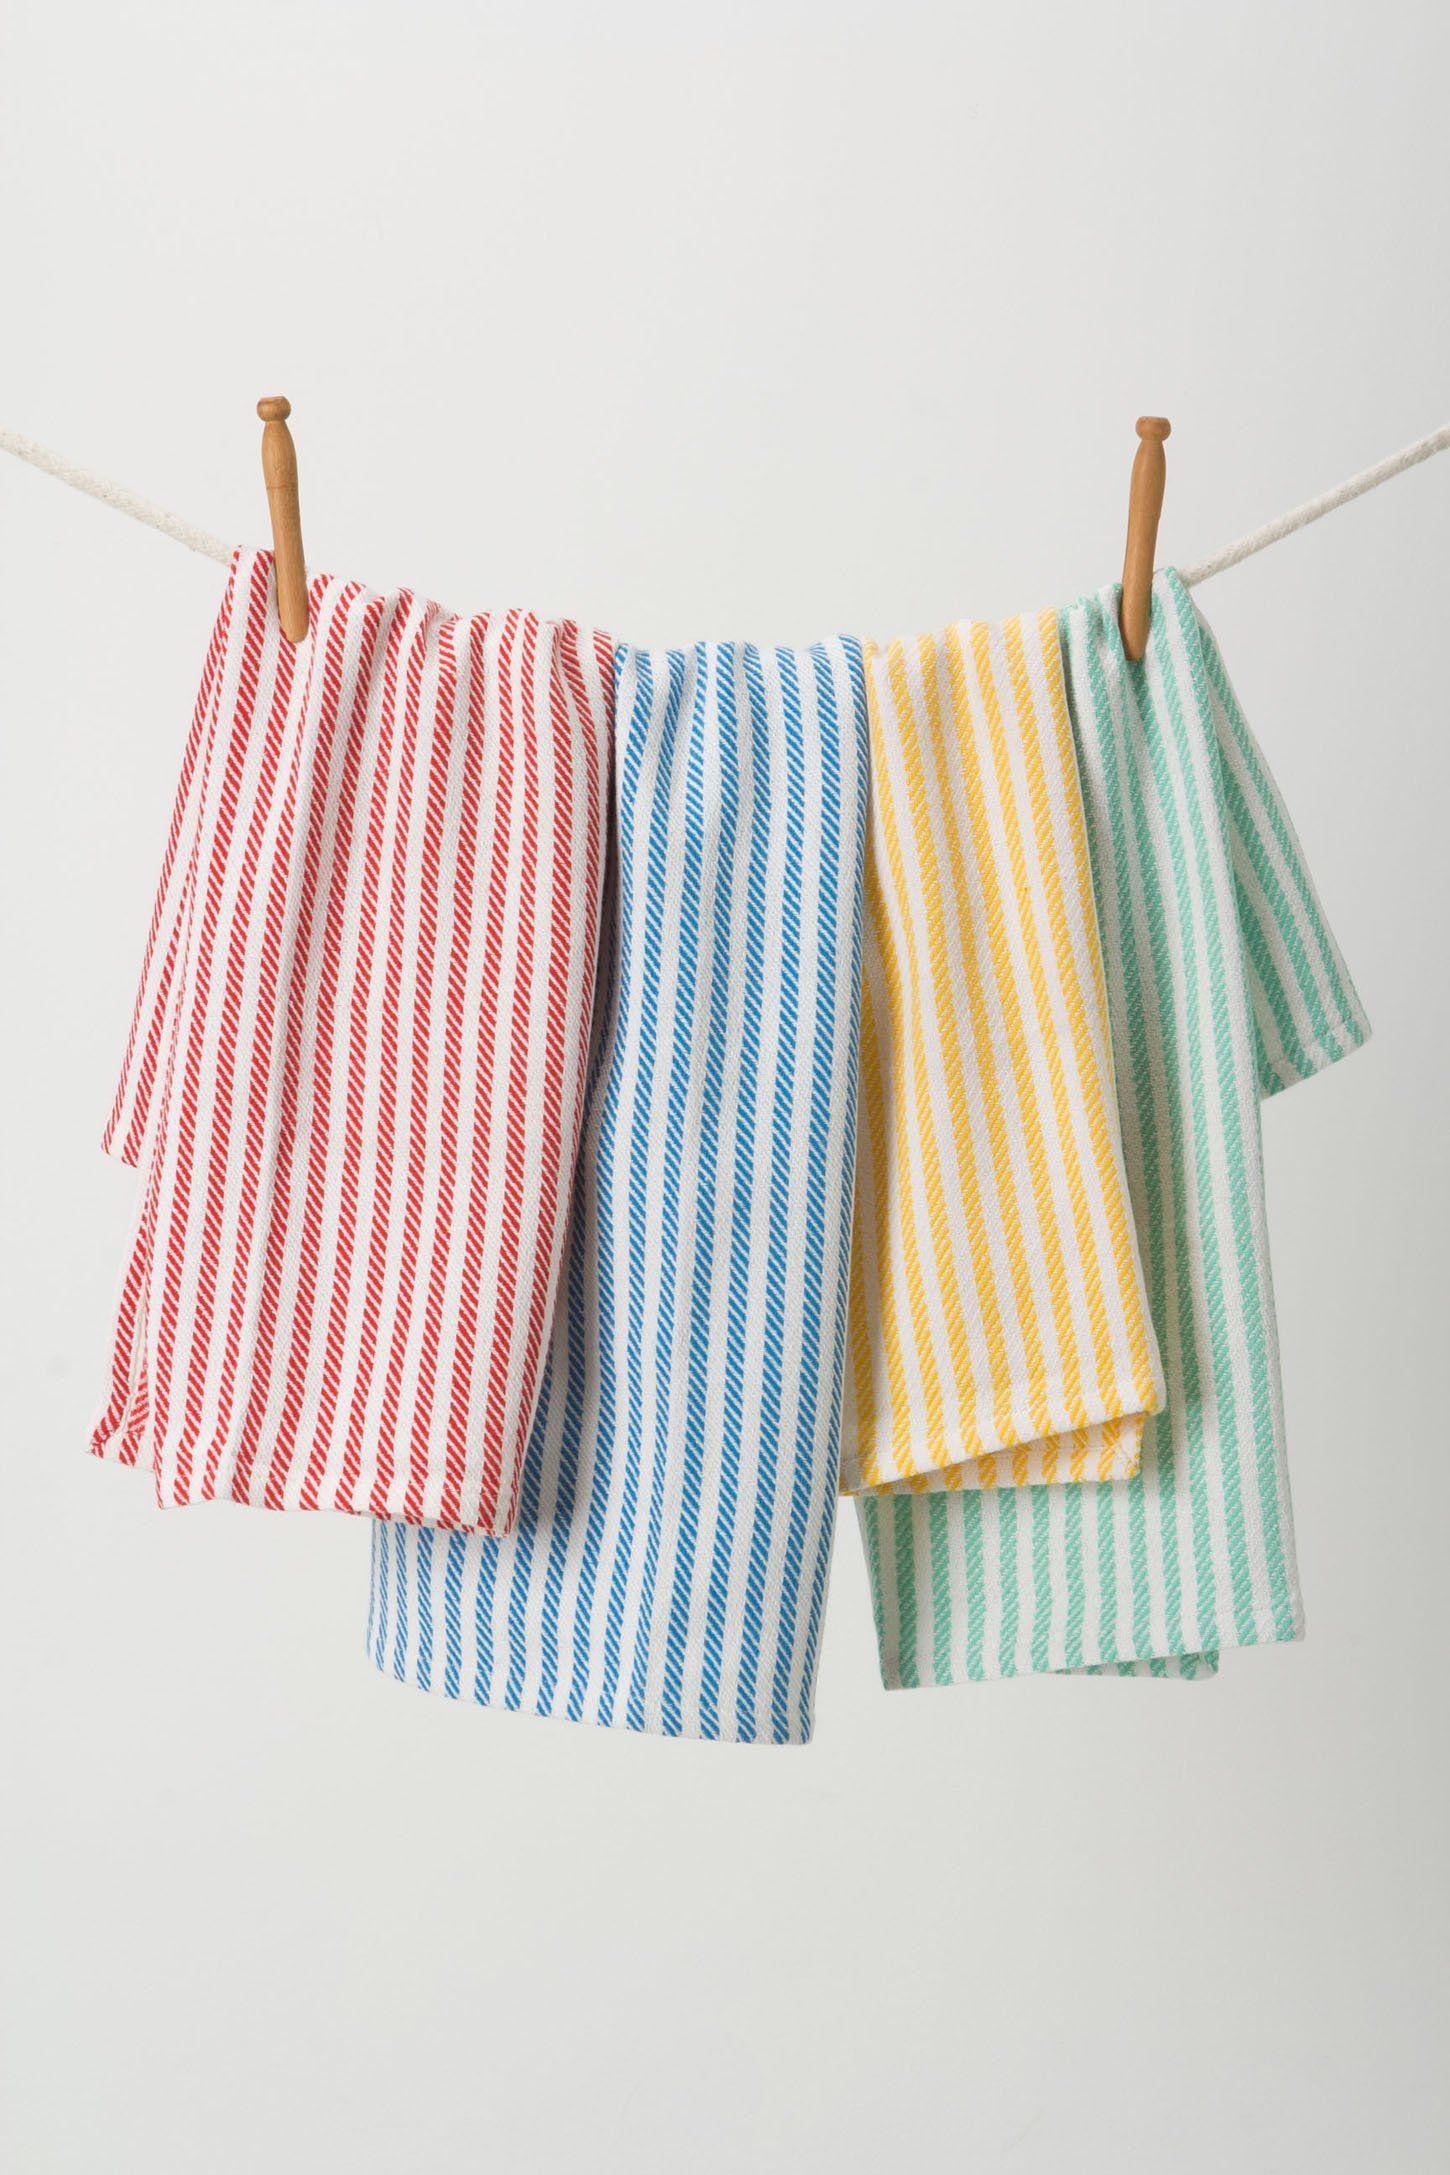 Wash & Dry Tea Towels - Anthropologie.com | bohemian | Pinterest ...